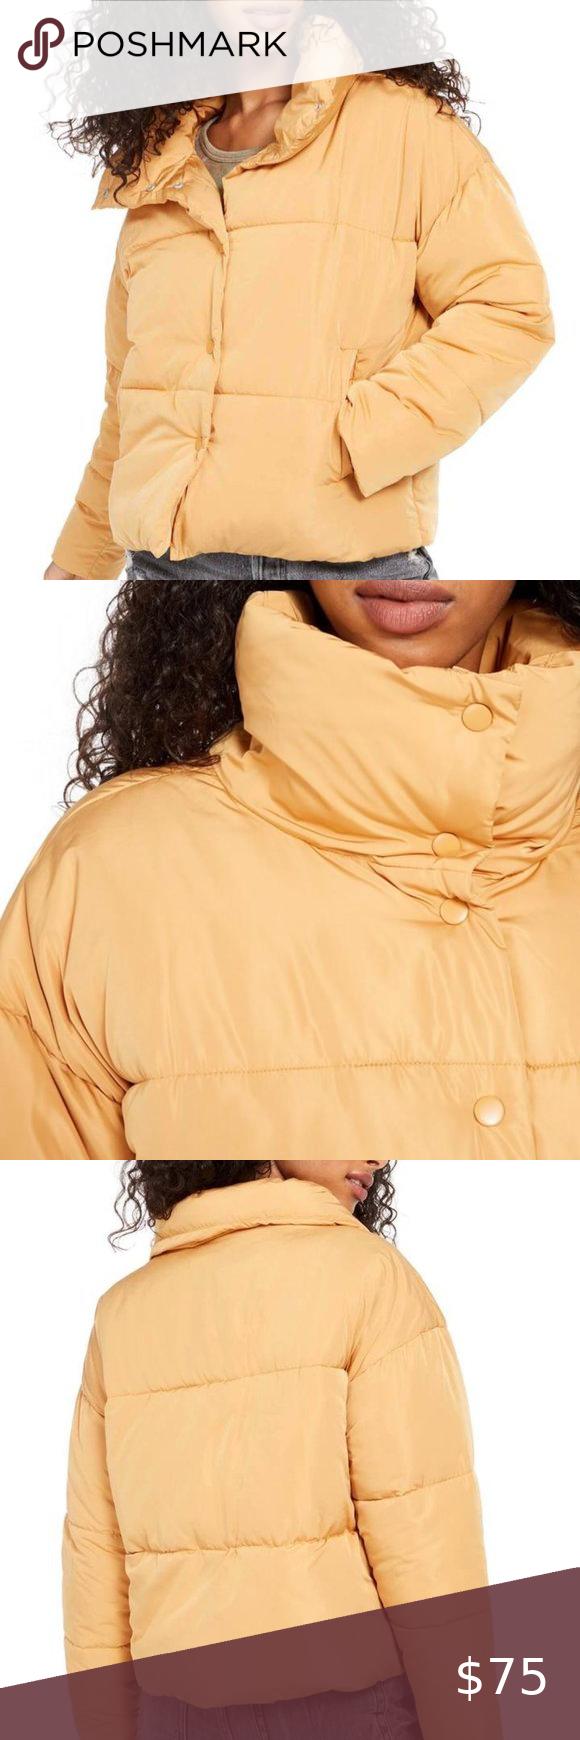 Free People Weekender Puffer Jacket In Bronze Nwt Women S Puffer Coats Coats Jackets Women Oversized Puffer Coat [ 1740 x 580 Pixel ]